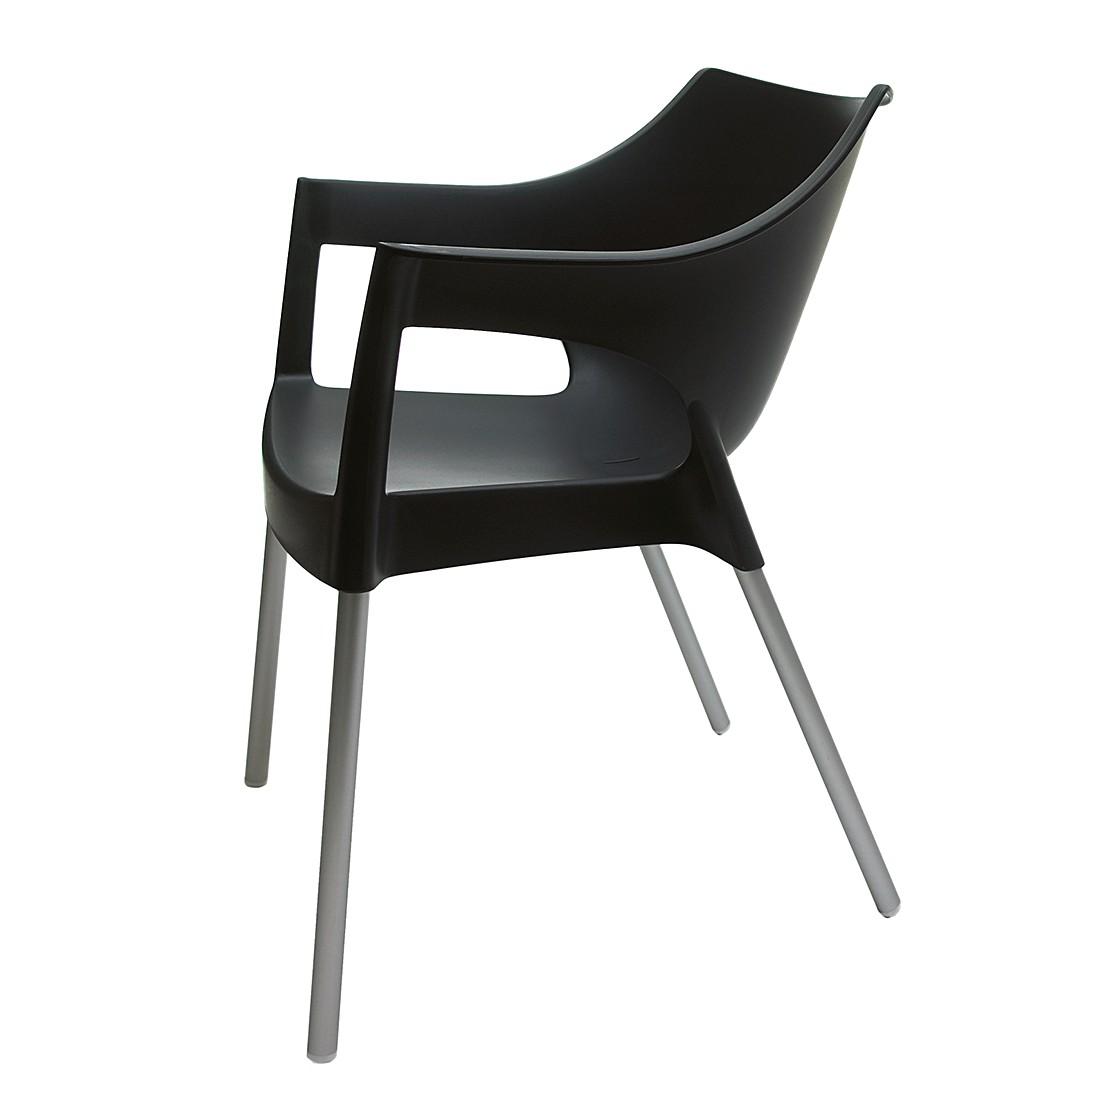 stapelst hle schwarz preis vergleich 2016. Black Bedroom Furniture Sets. Home Design Ideas